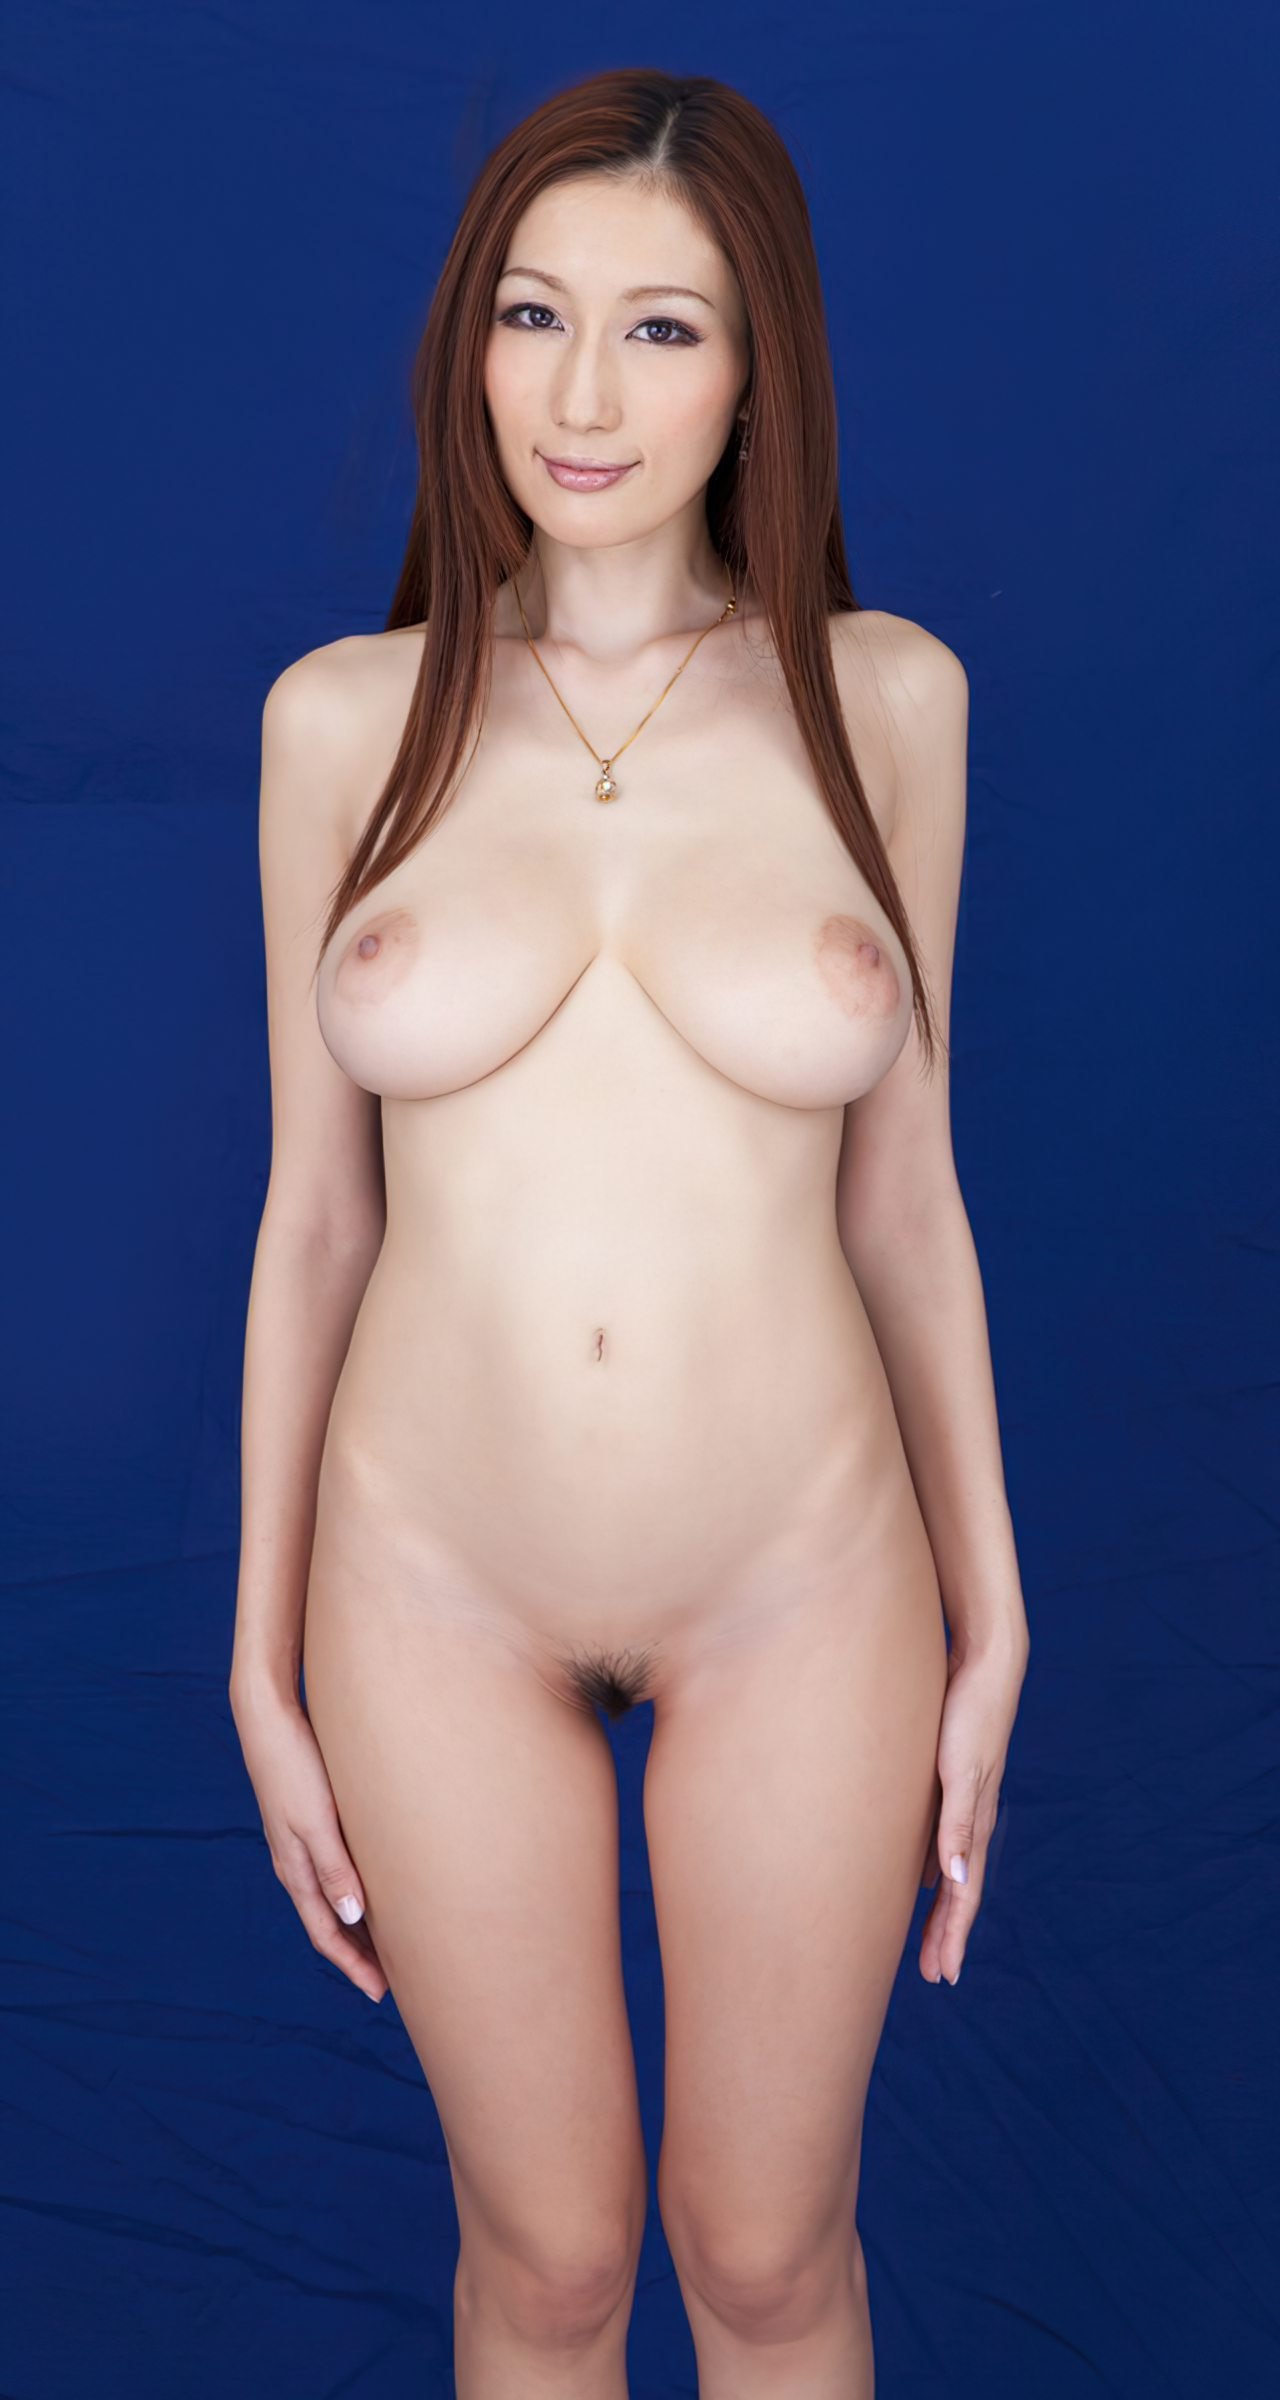 Mulheres Japonesas Peladas (1)